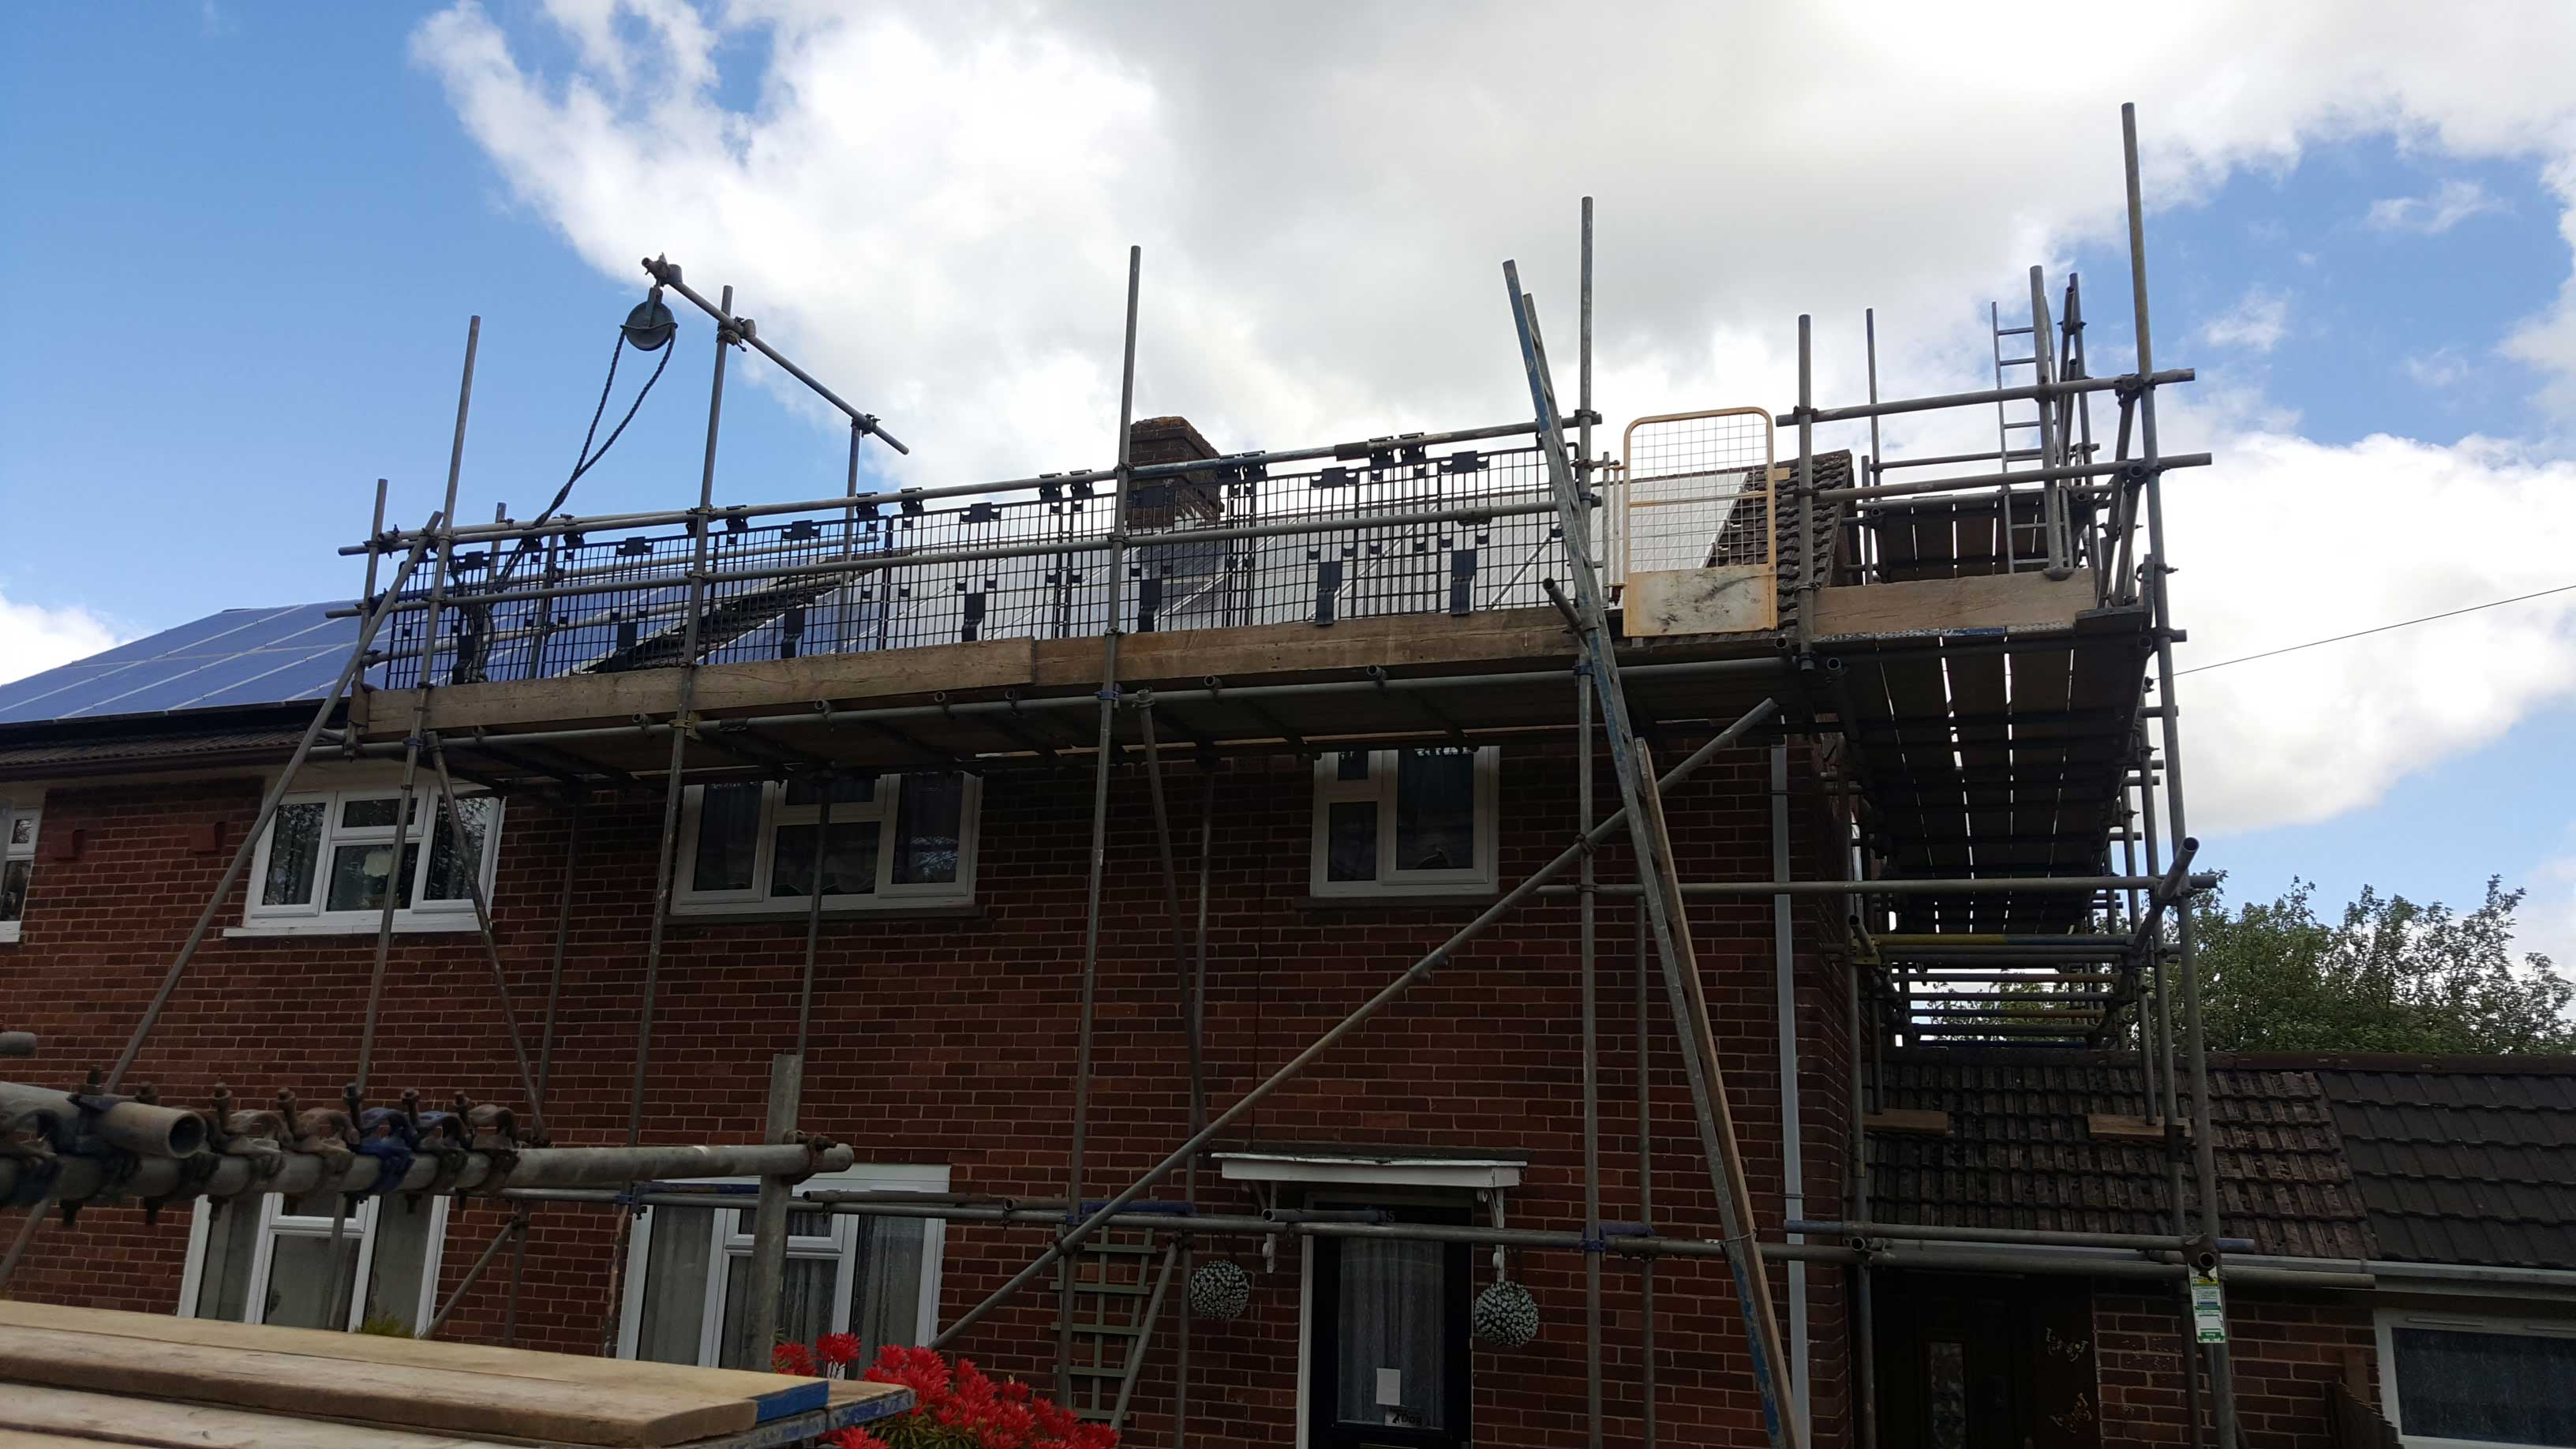 Roof Scaffold Tiverton and Devon - Rapid Scaffold Ltd